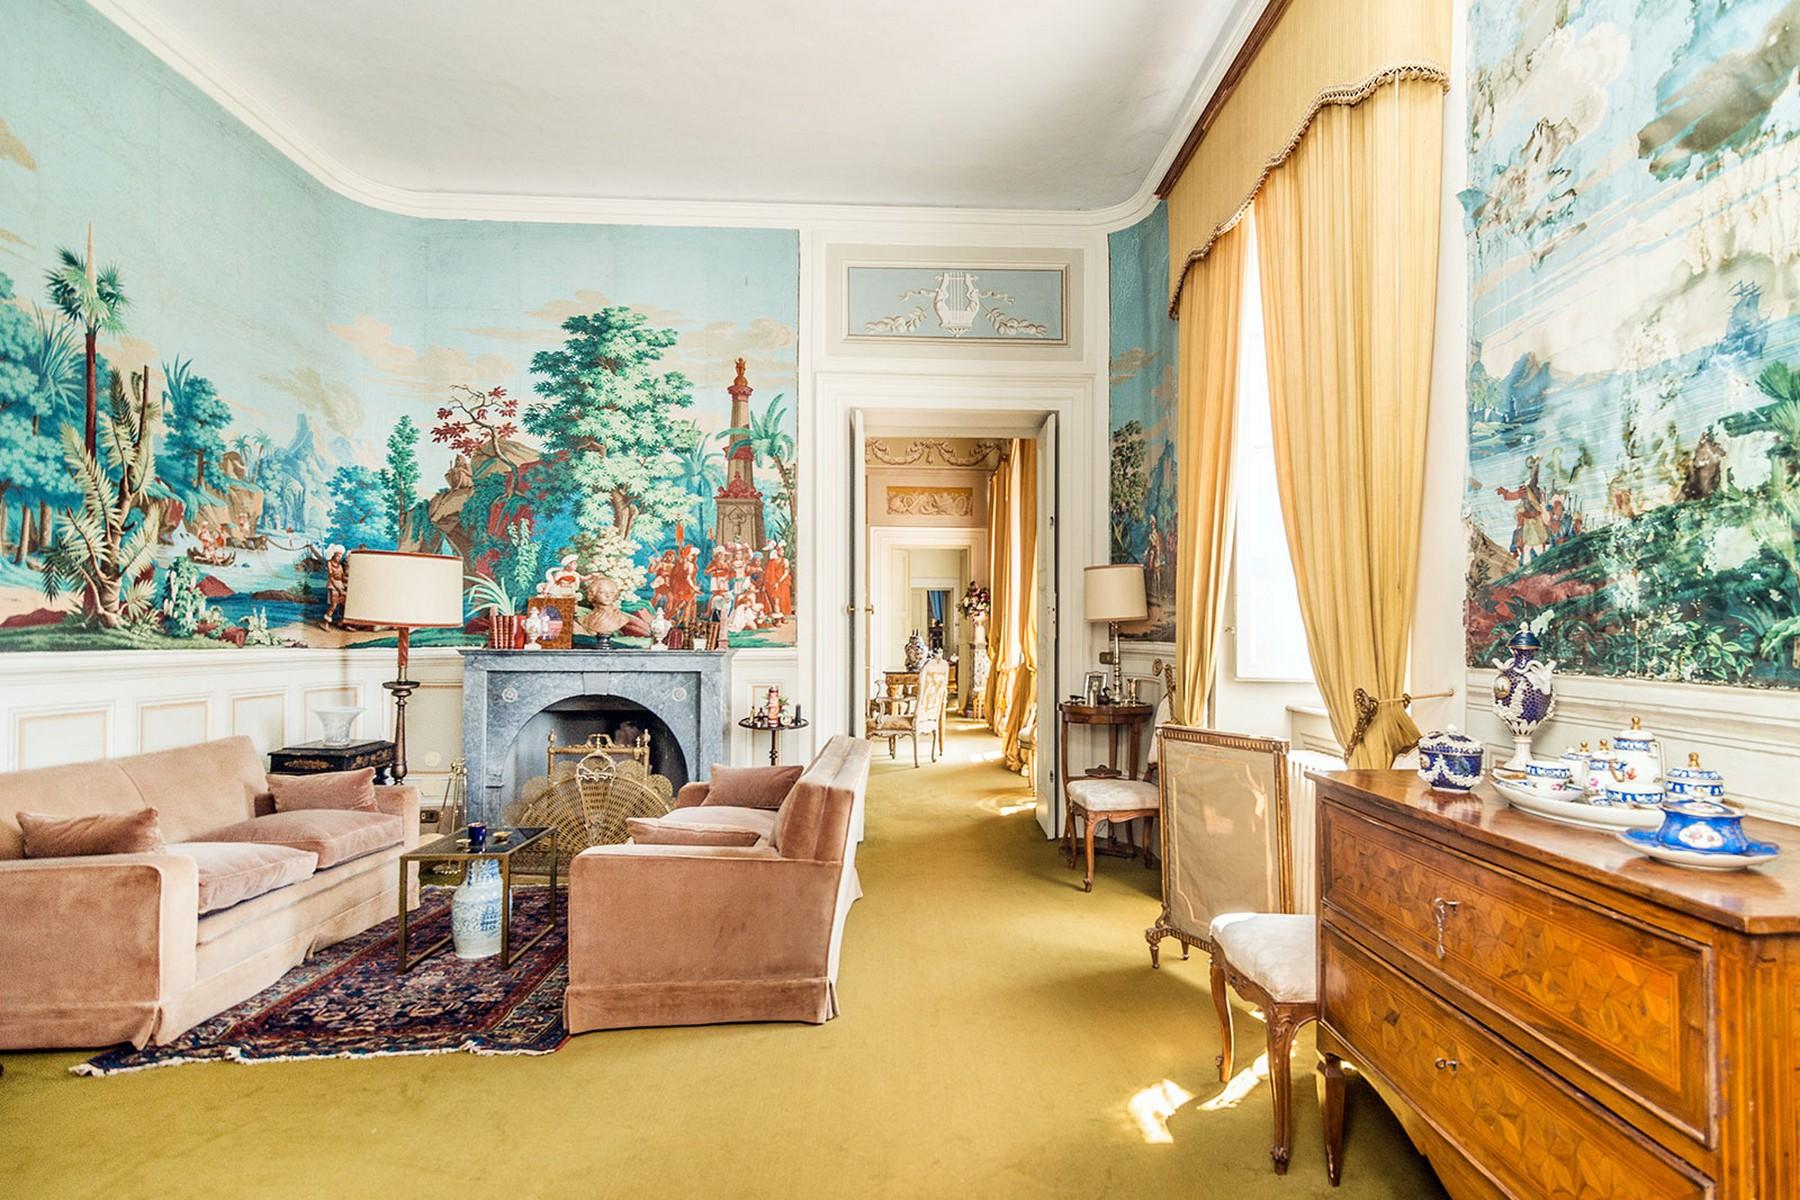 Villa in Vendita a Capannori: 5 locali, 4360 mq - Foto 27